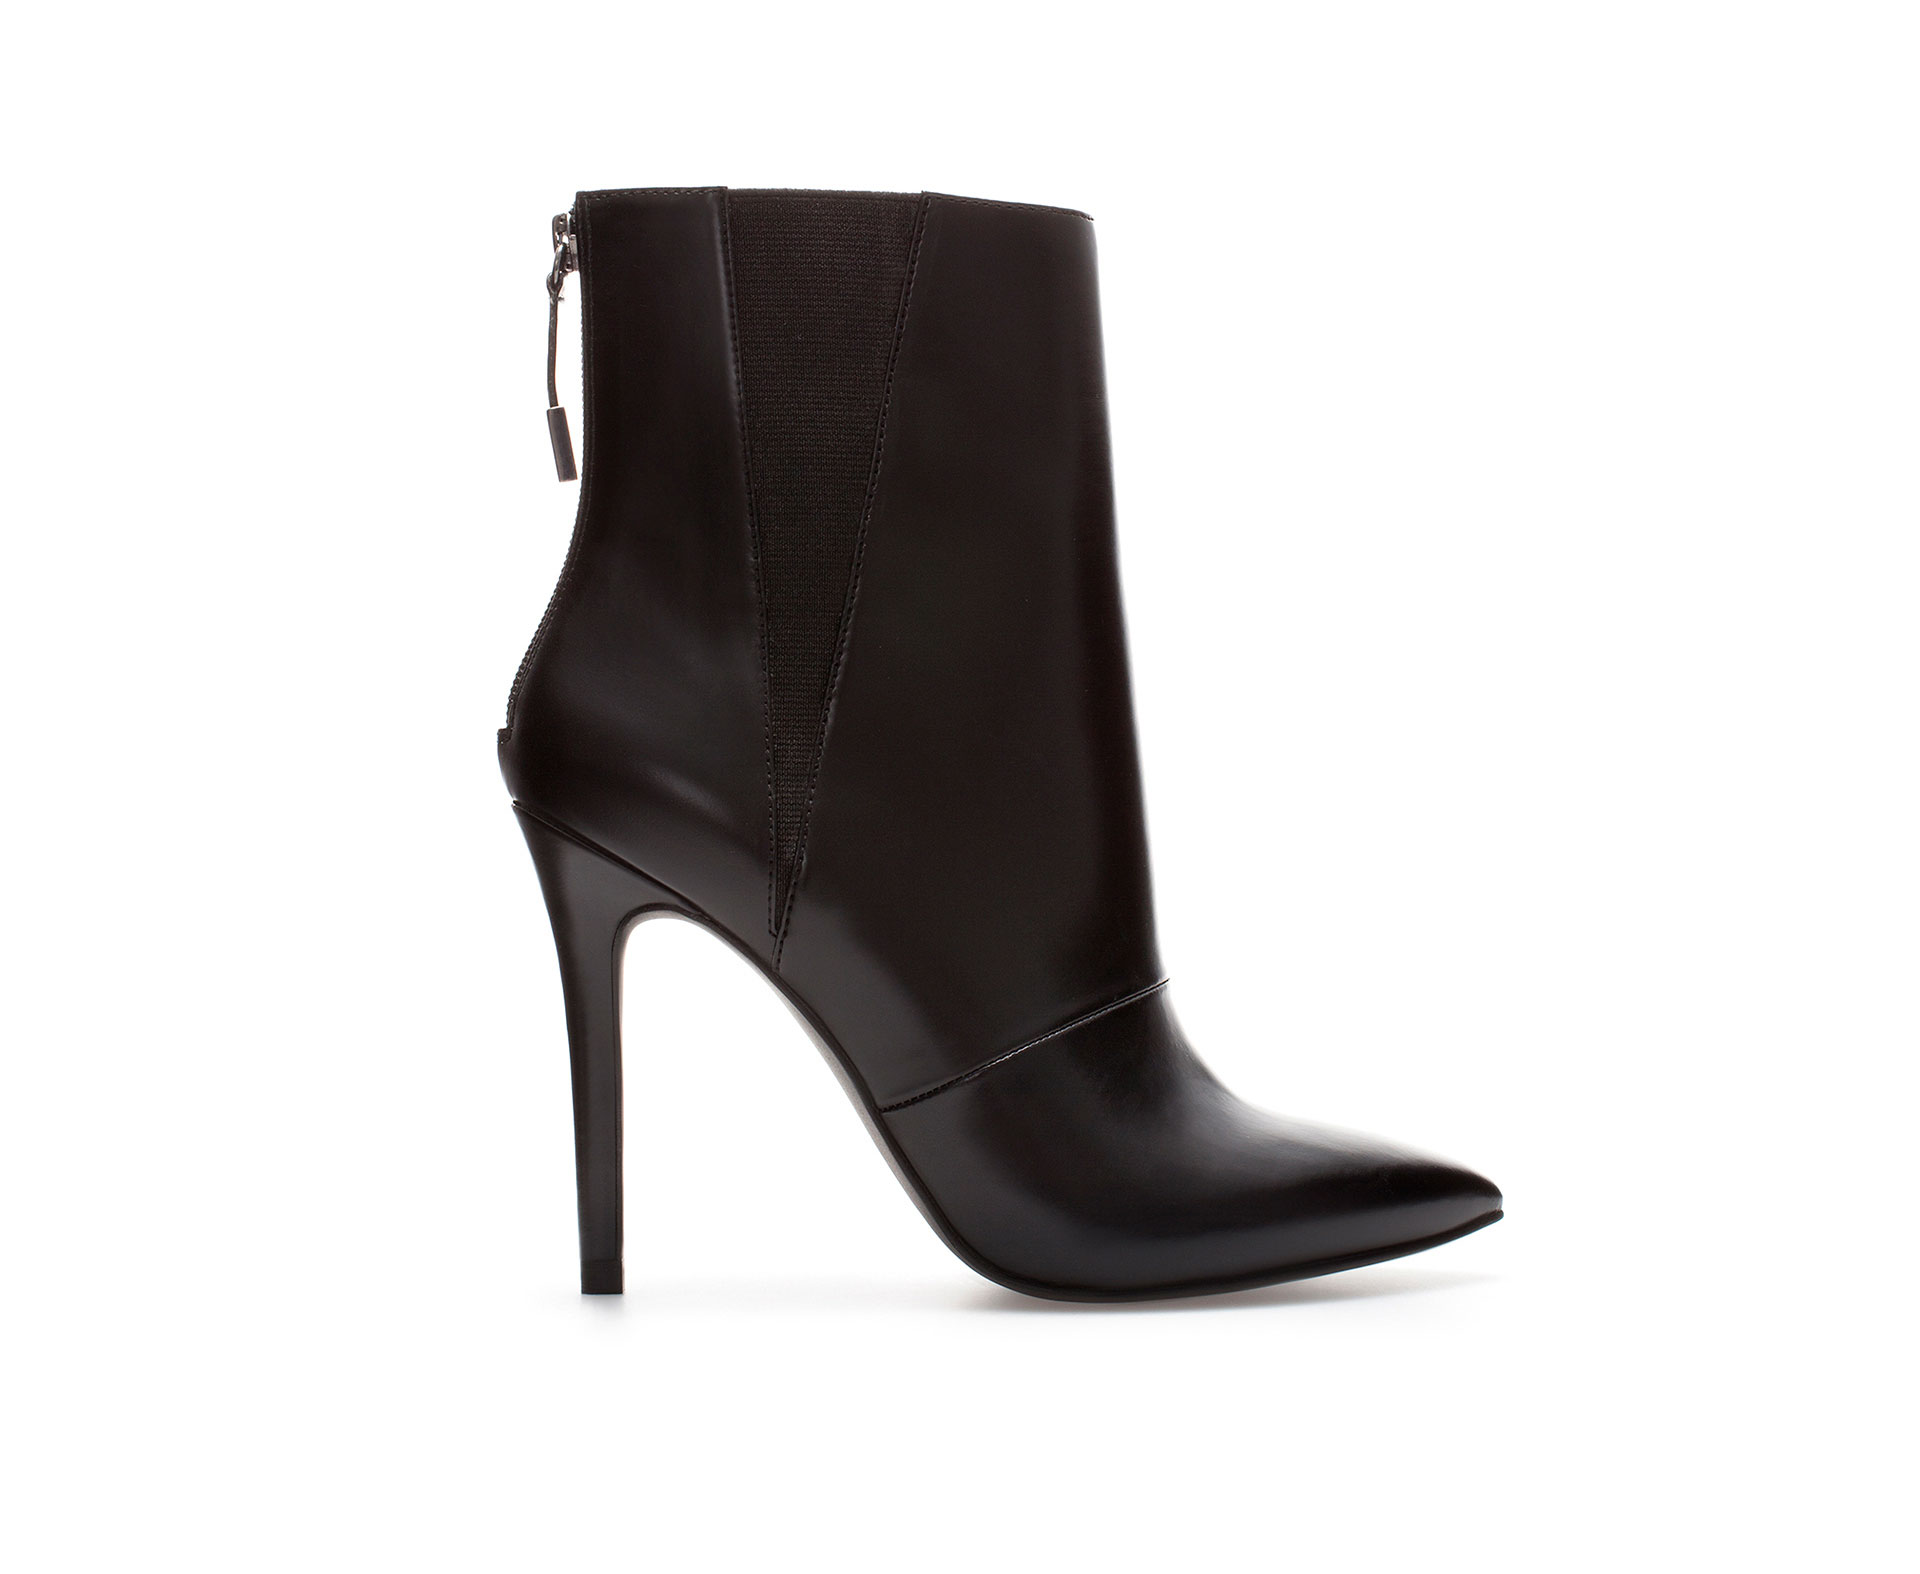 Zara Stiletto Heel Ankle Boot in Black | Lyst